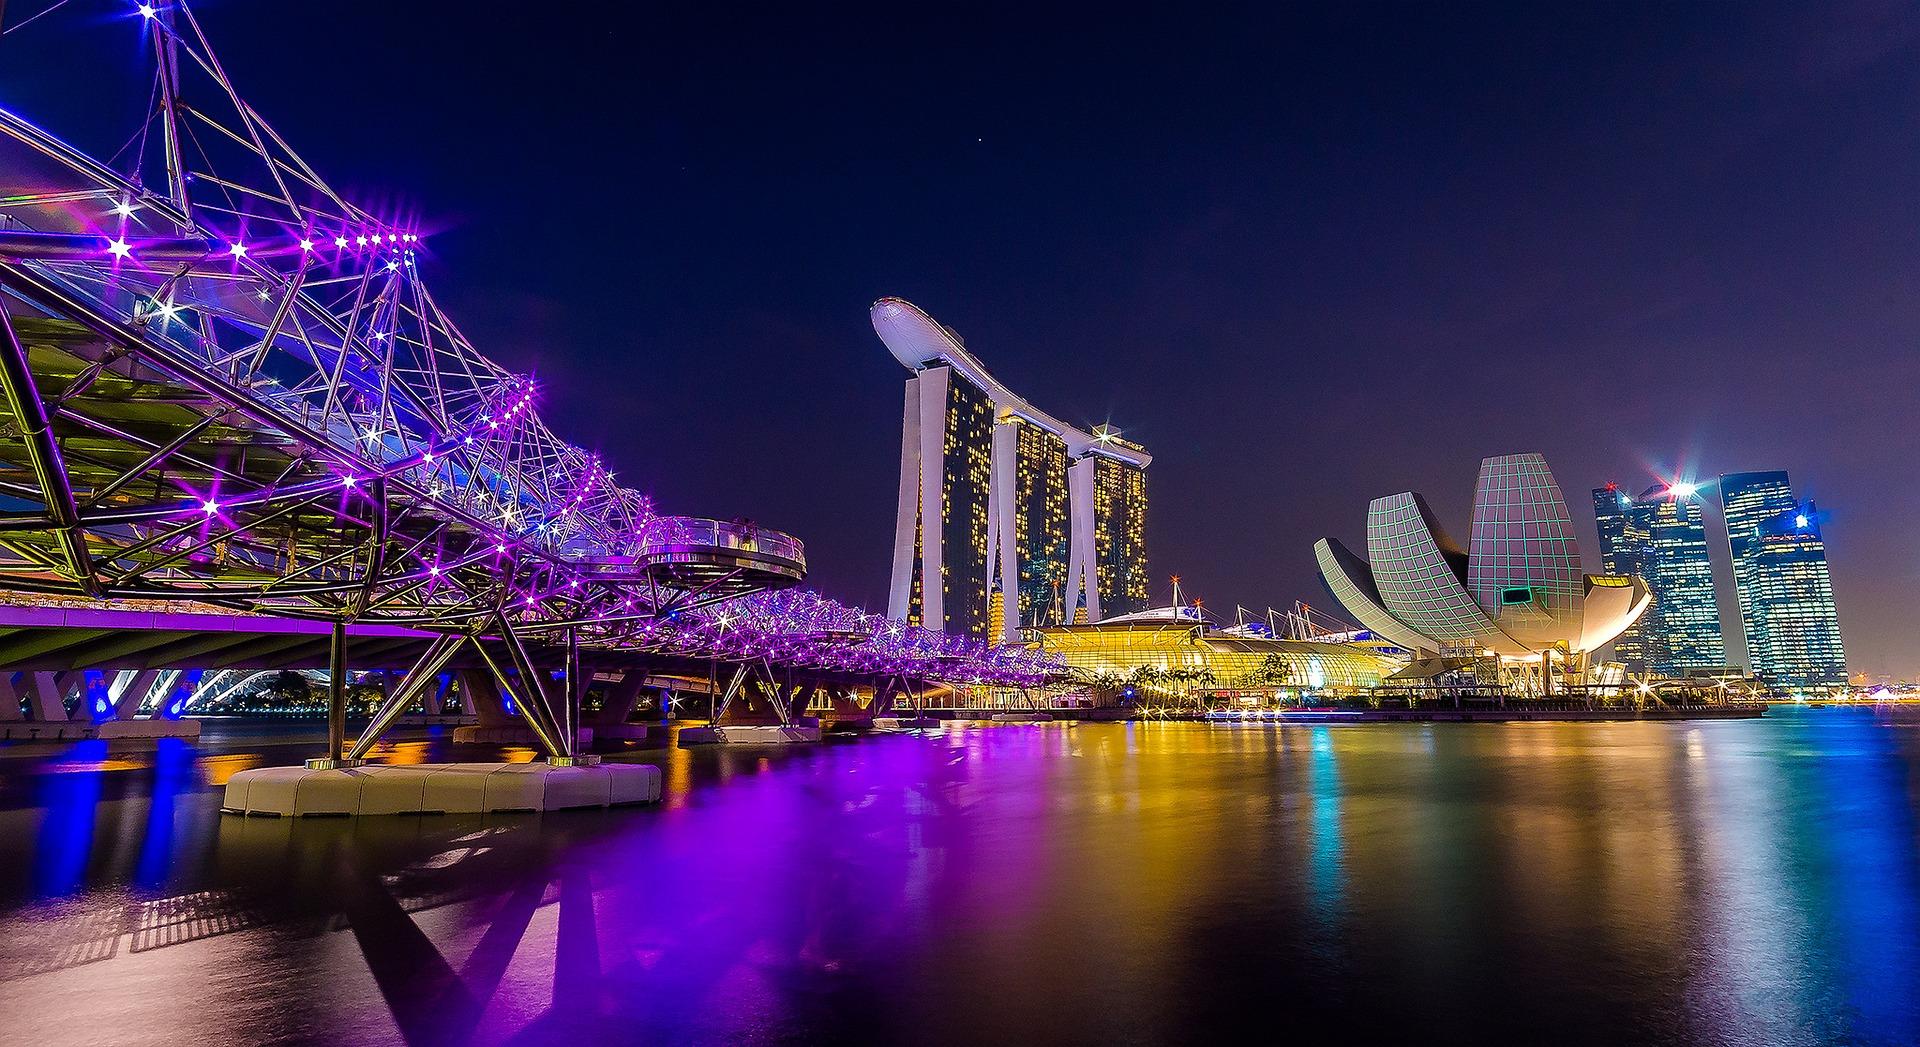 singapore 2699988 1920 1